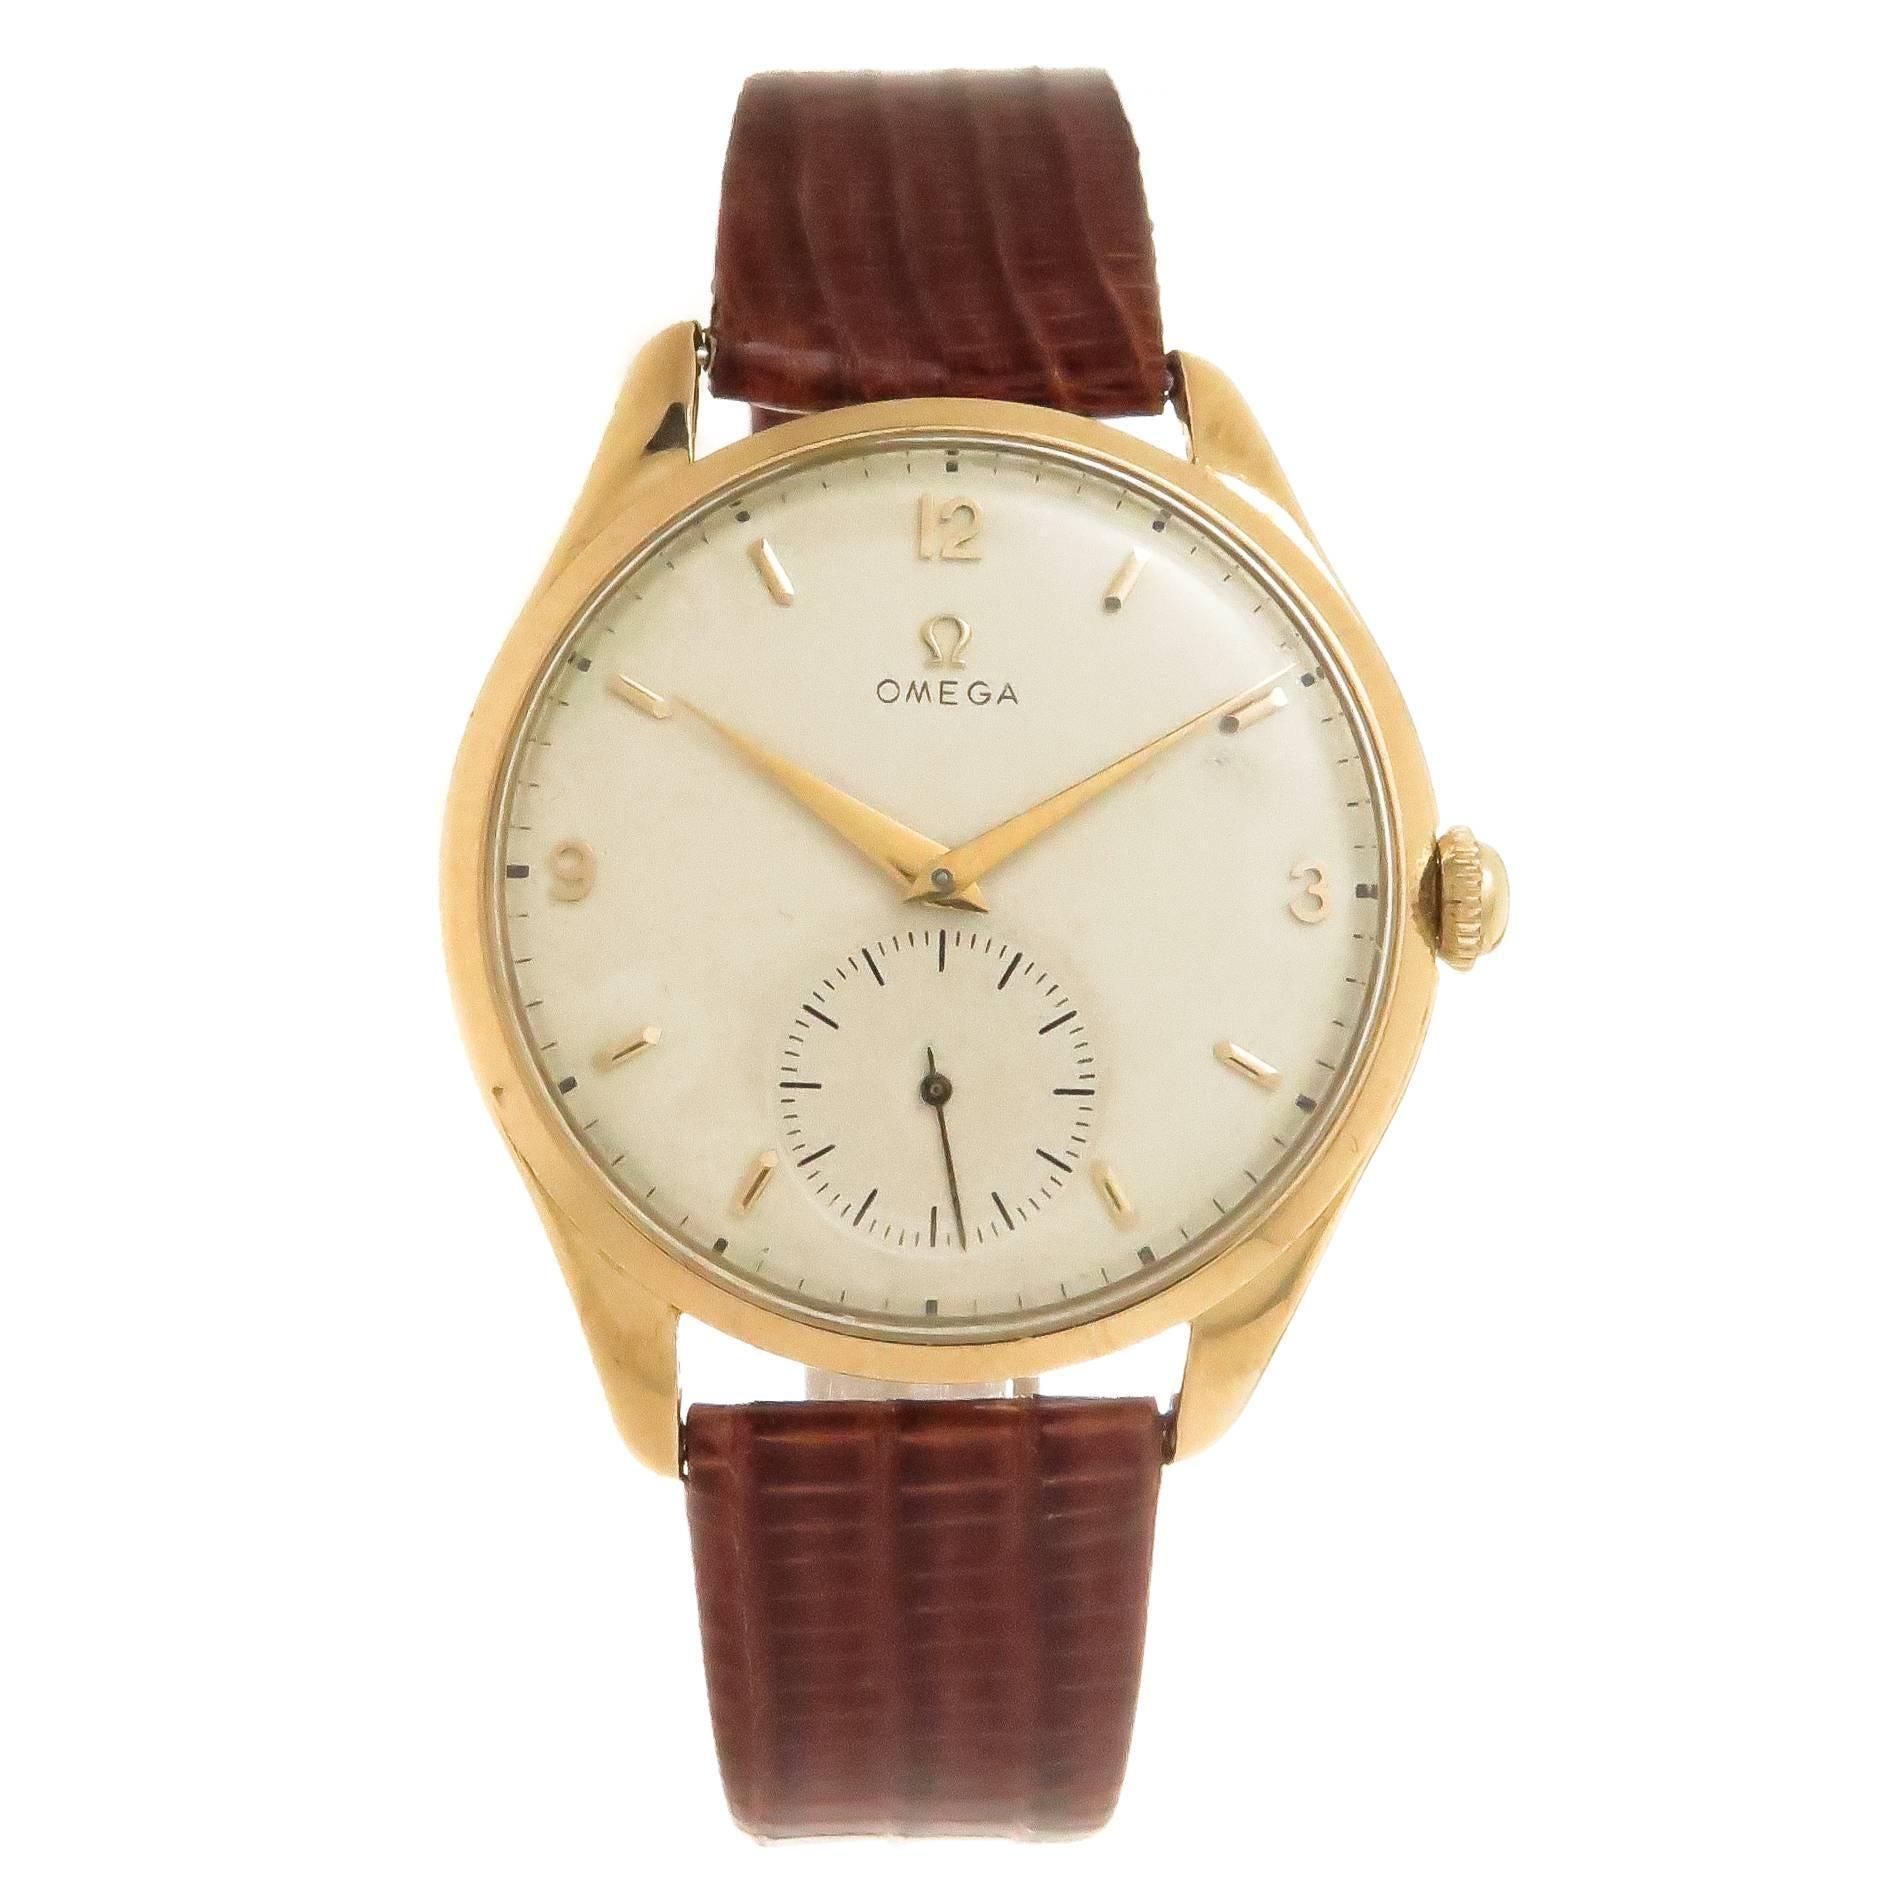 Omega Yellow Gold Oversized Manual Wind Wristwatch, 1940s